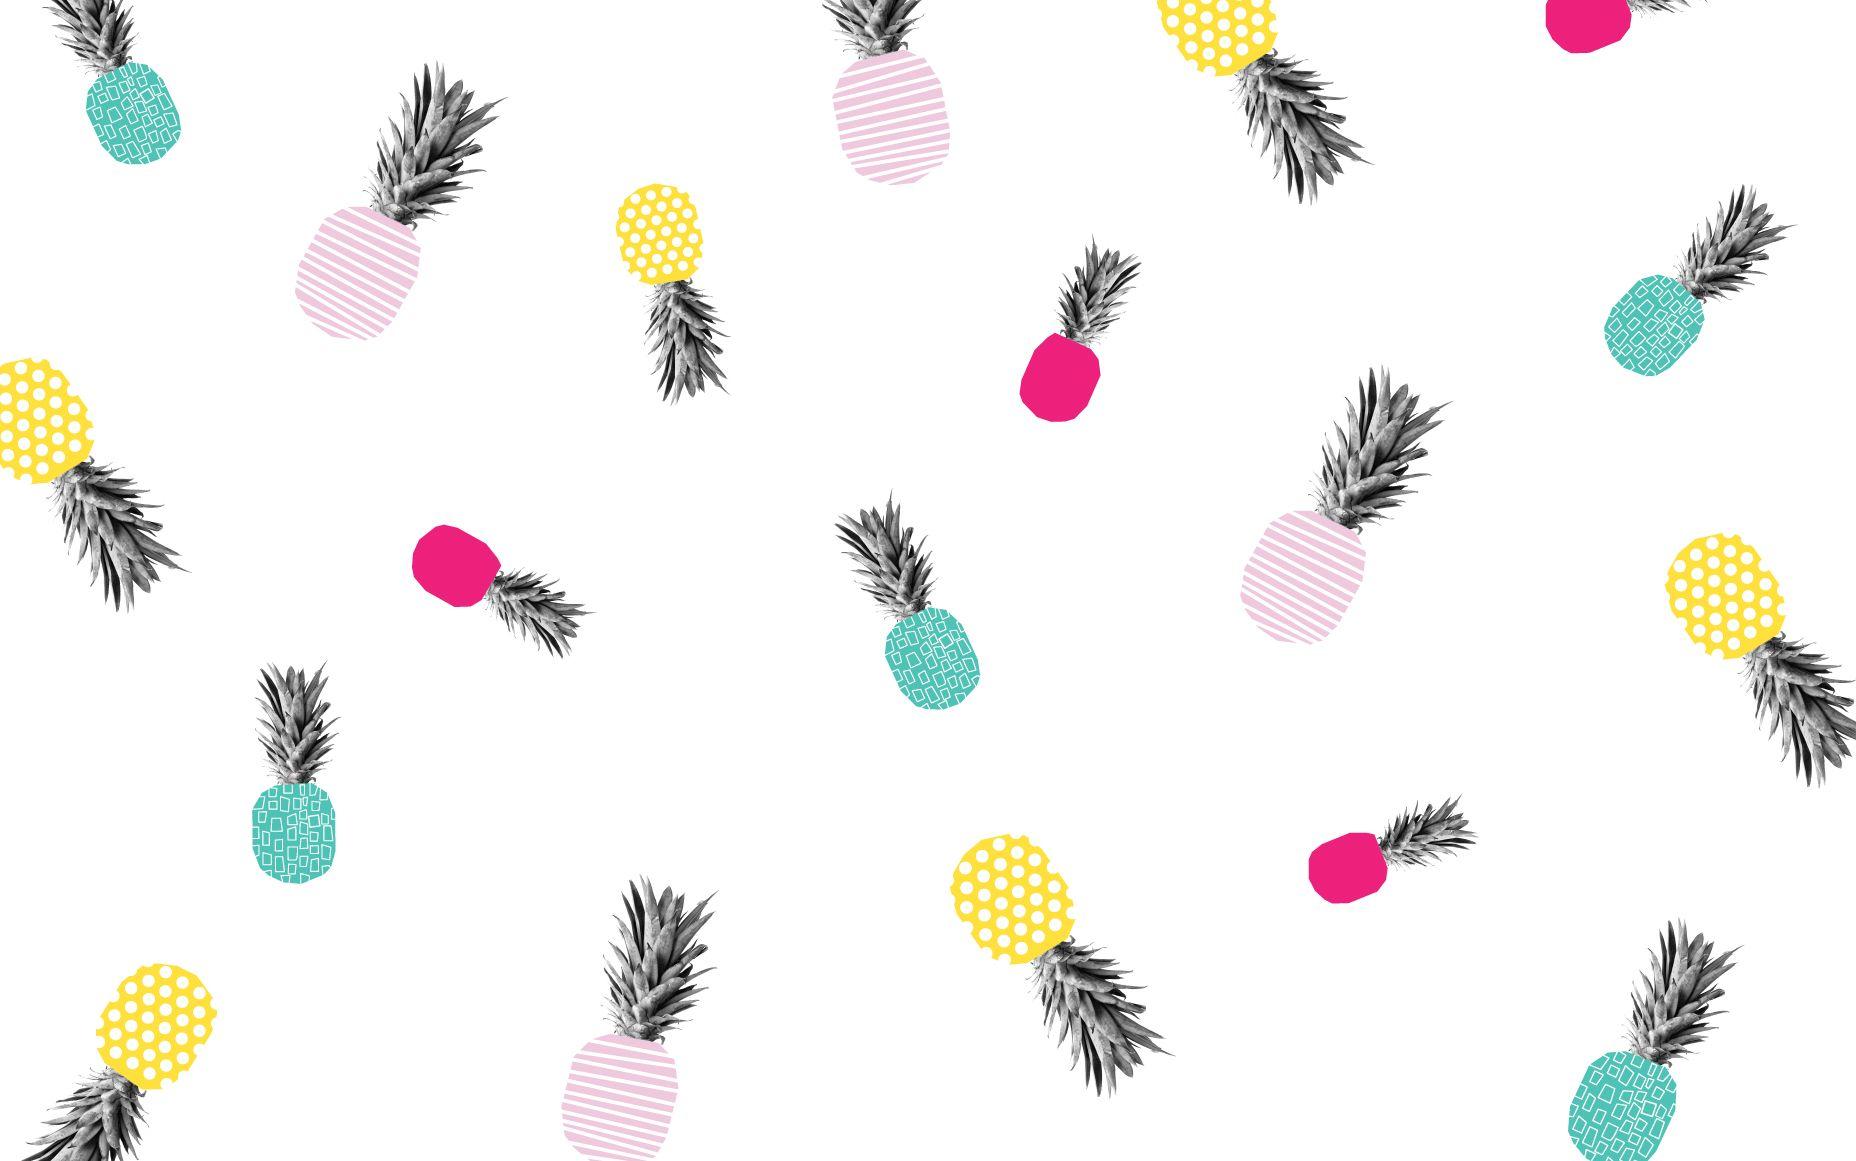 my summer desktop wallpapers for designlovefest